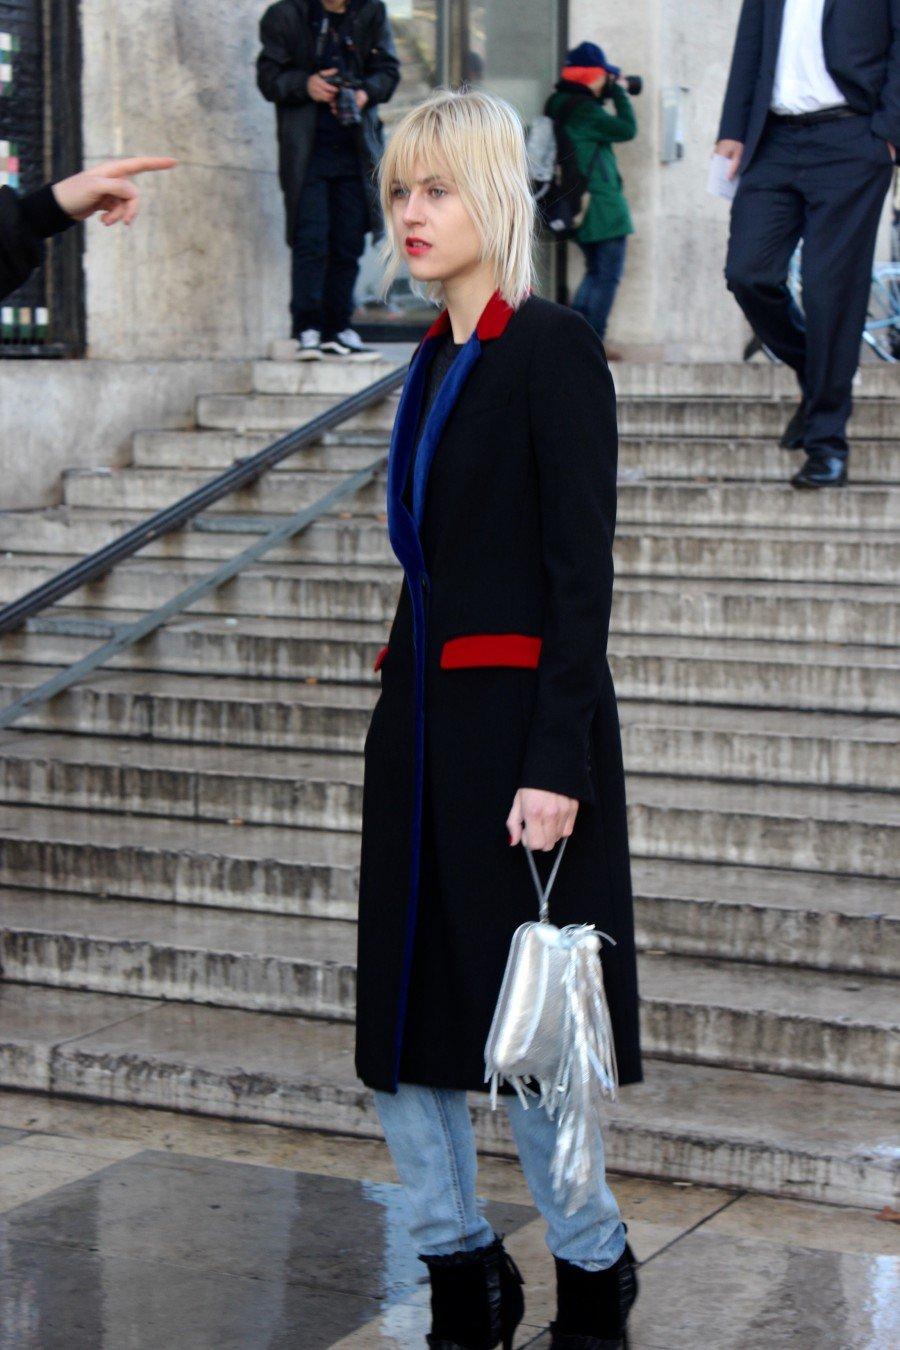 Model Paris Fashion week 2016